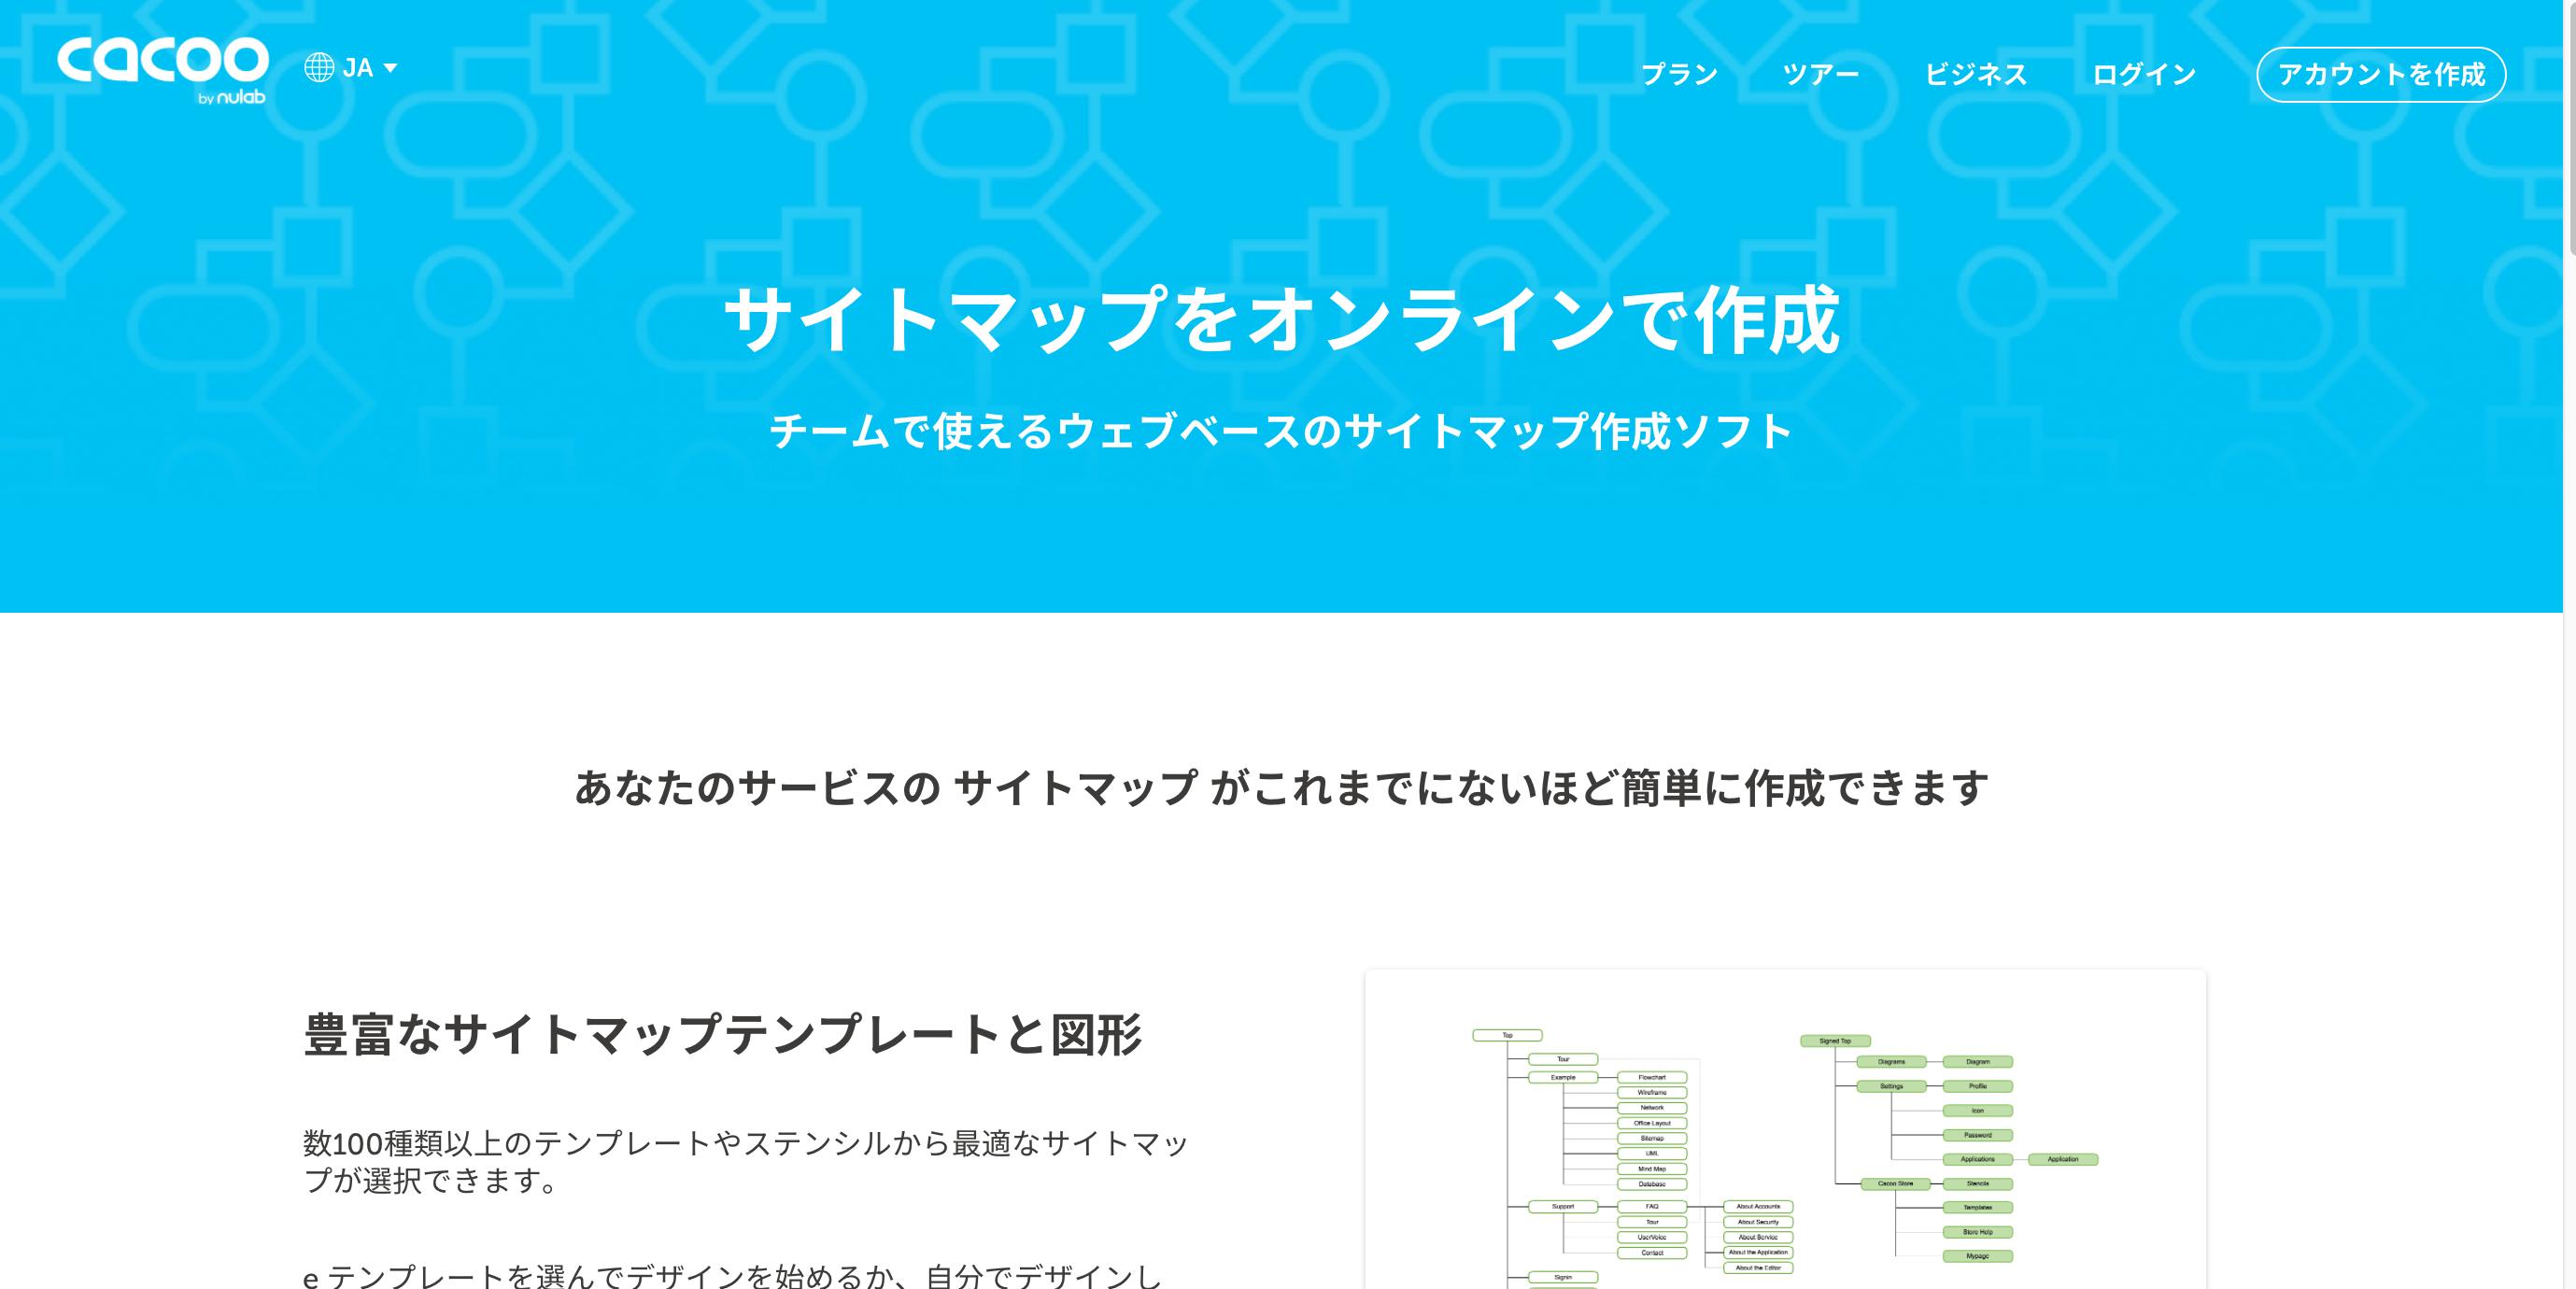 cacooinc - サイトマップをテンプレートを使って簡単に作成する方法